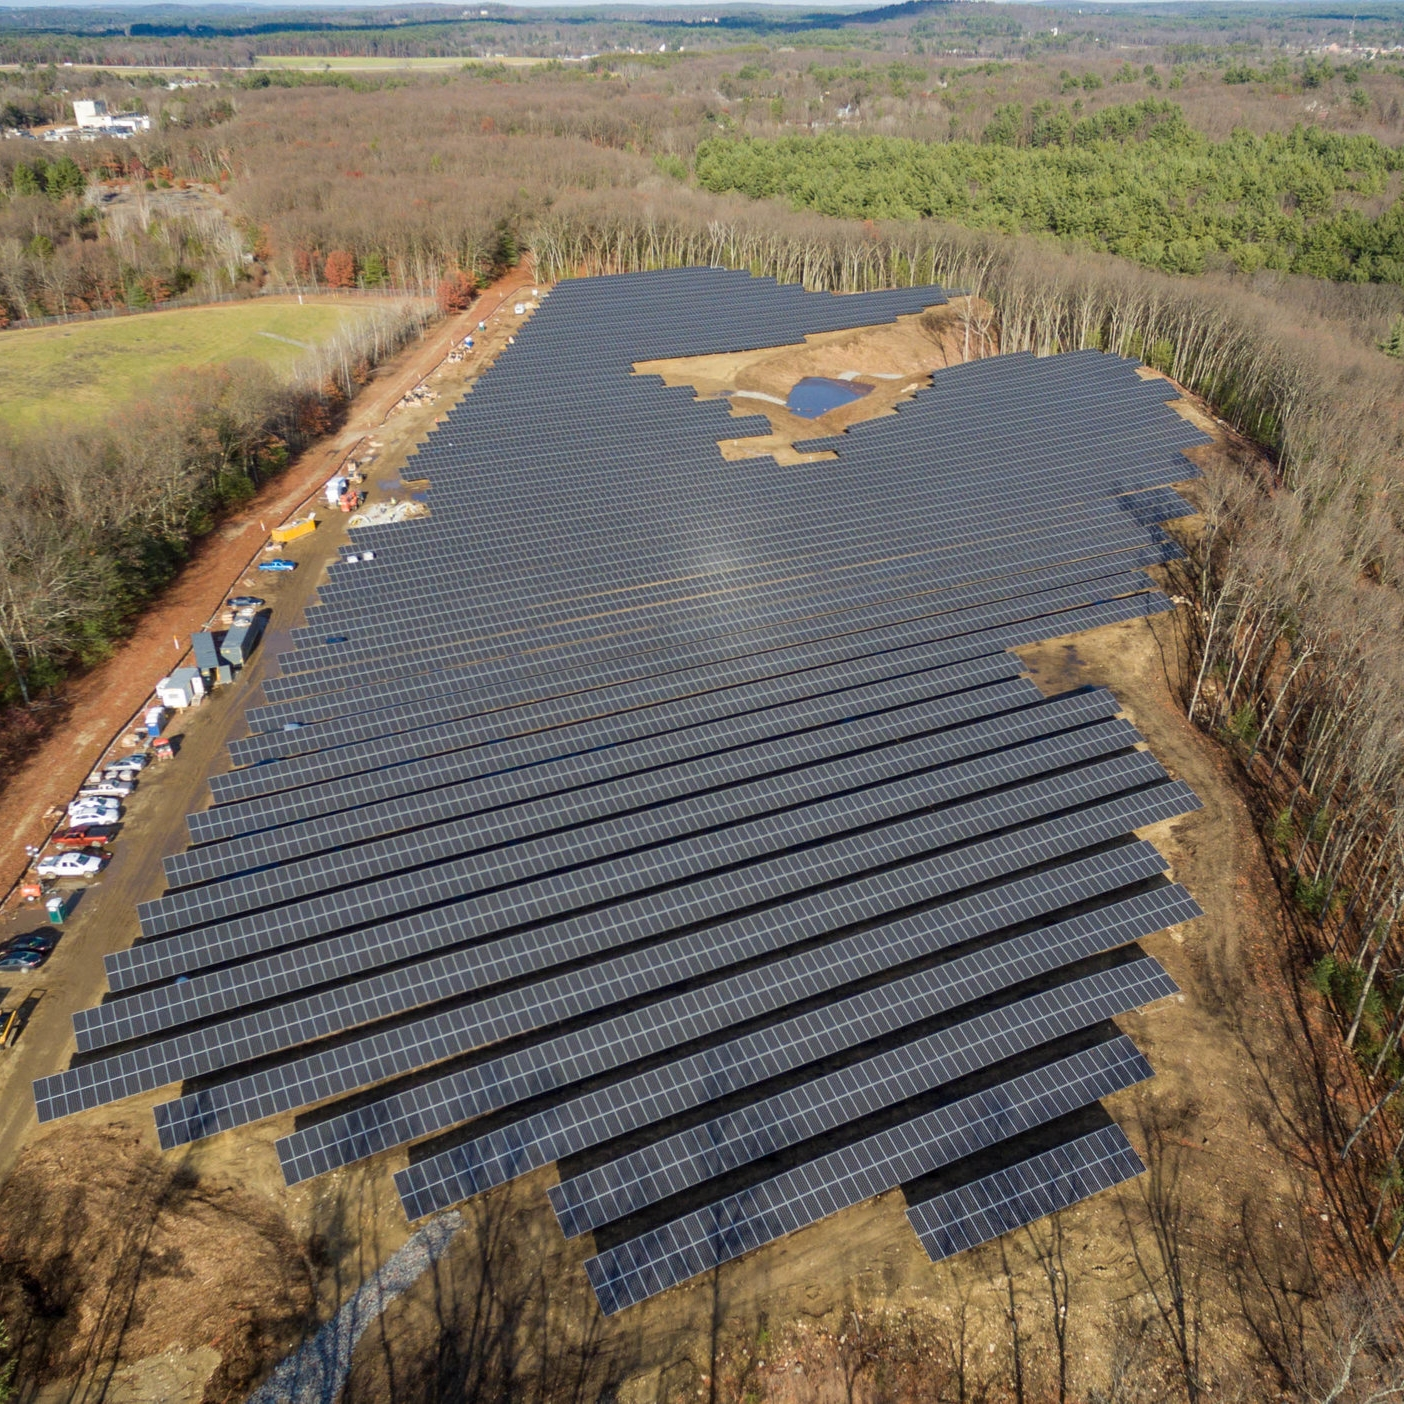 Concord II - 5.6 MW DC